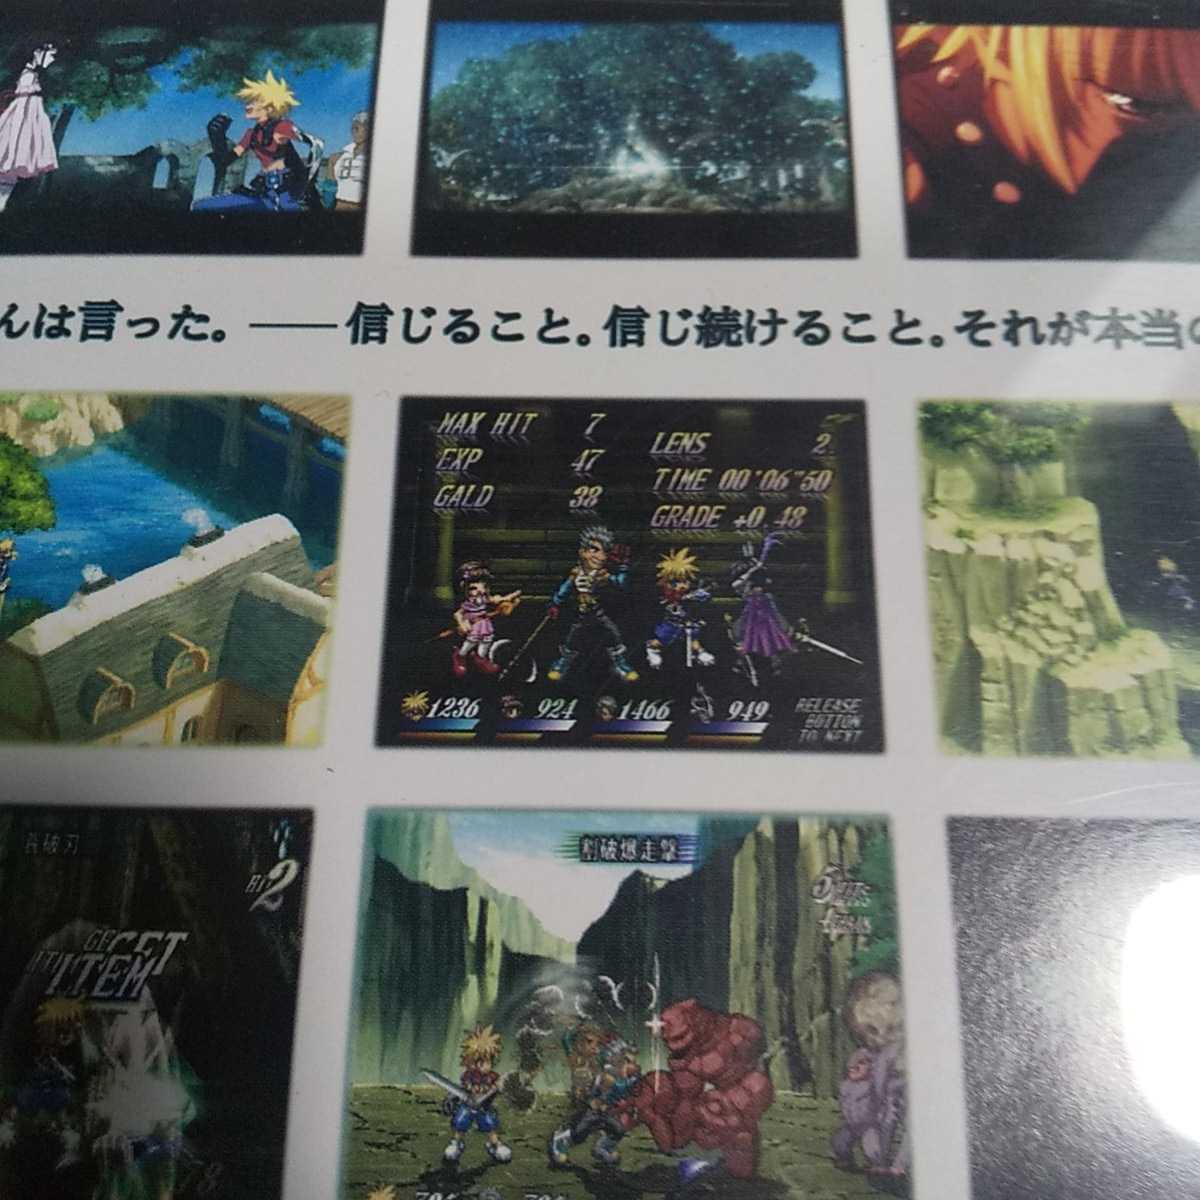 PS2【テイルズオブデスティニー2】ナムコ [送料無料] 返金保証あり